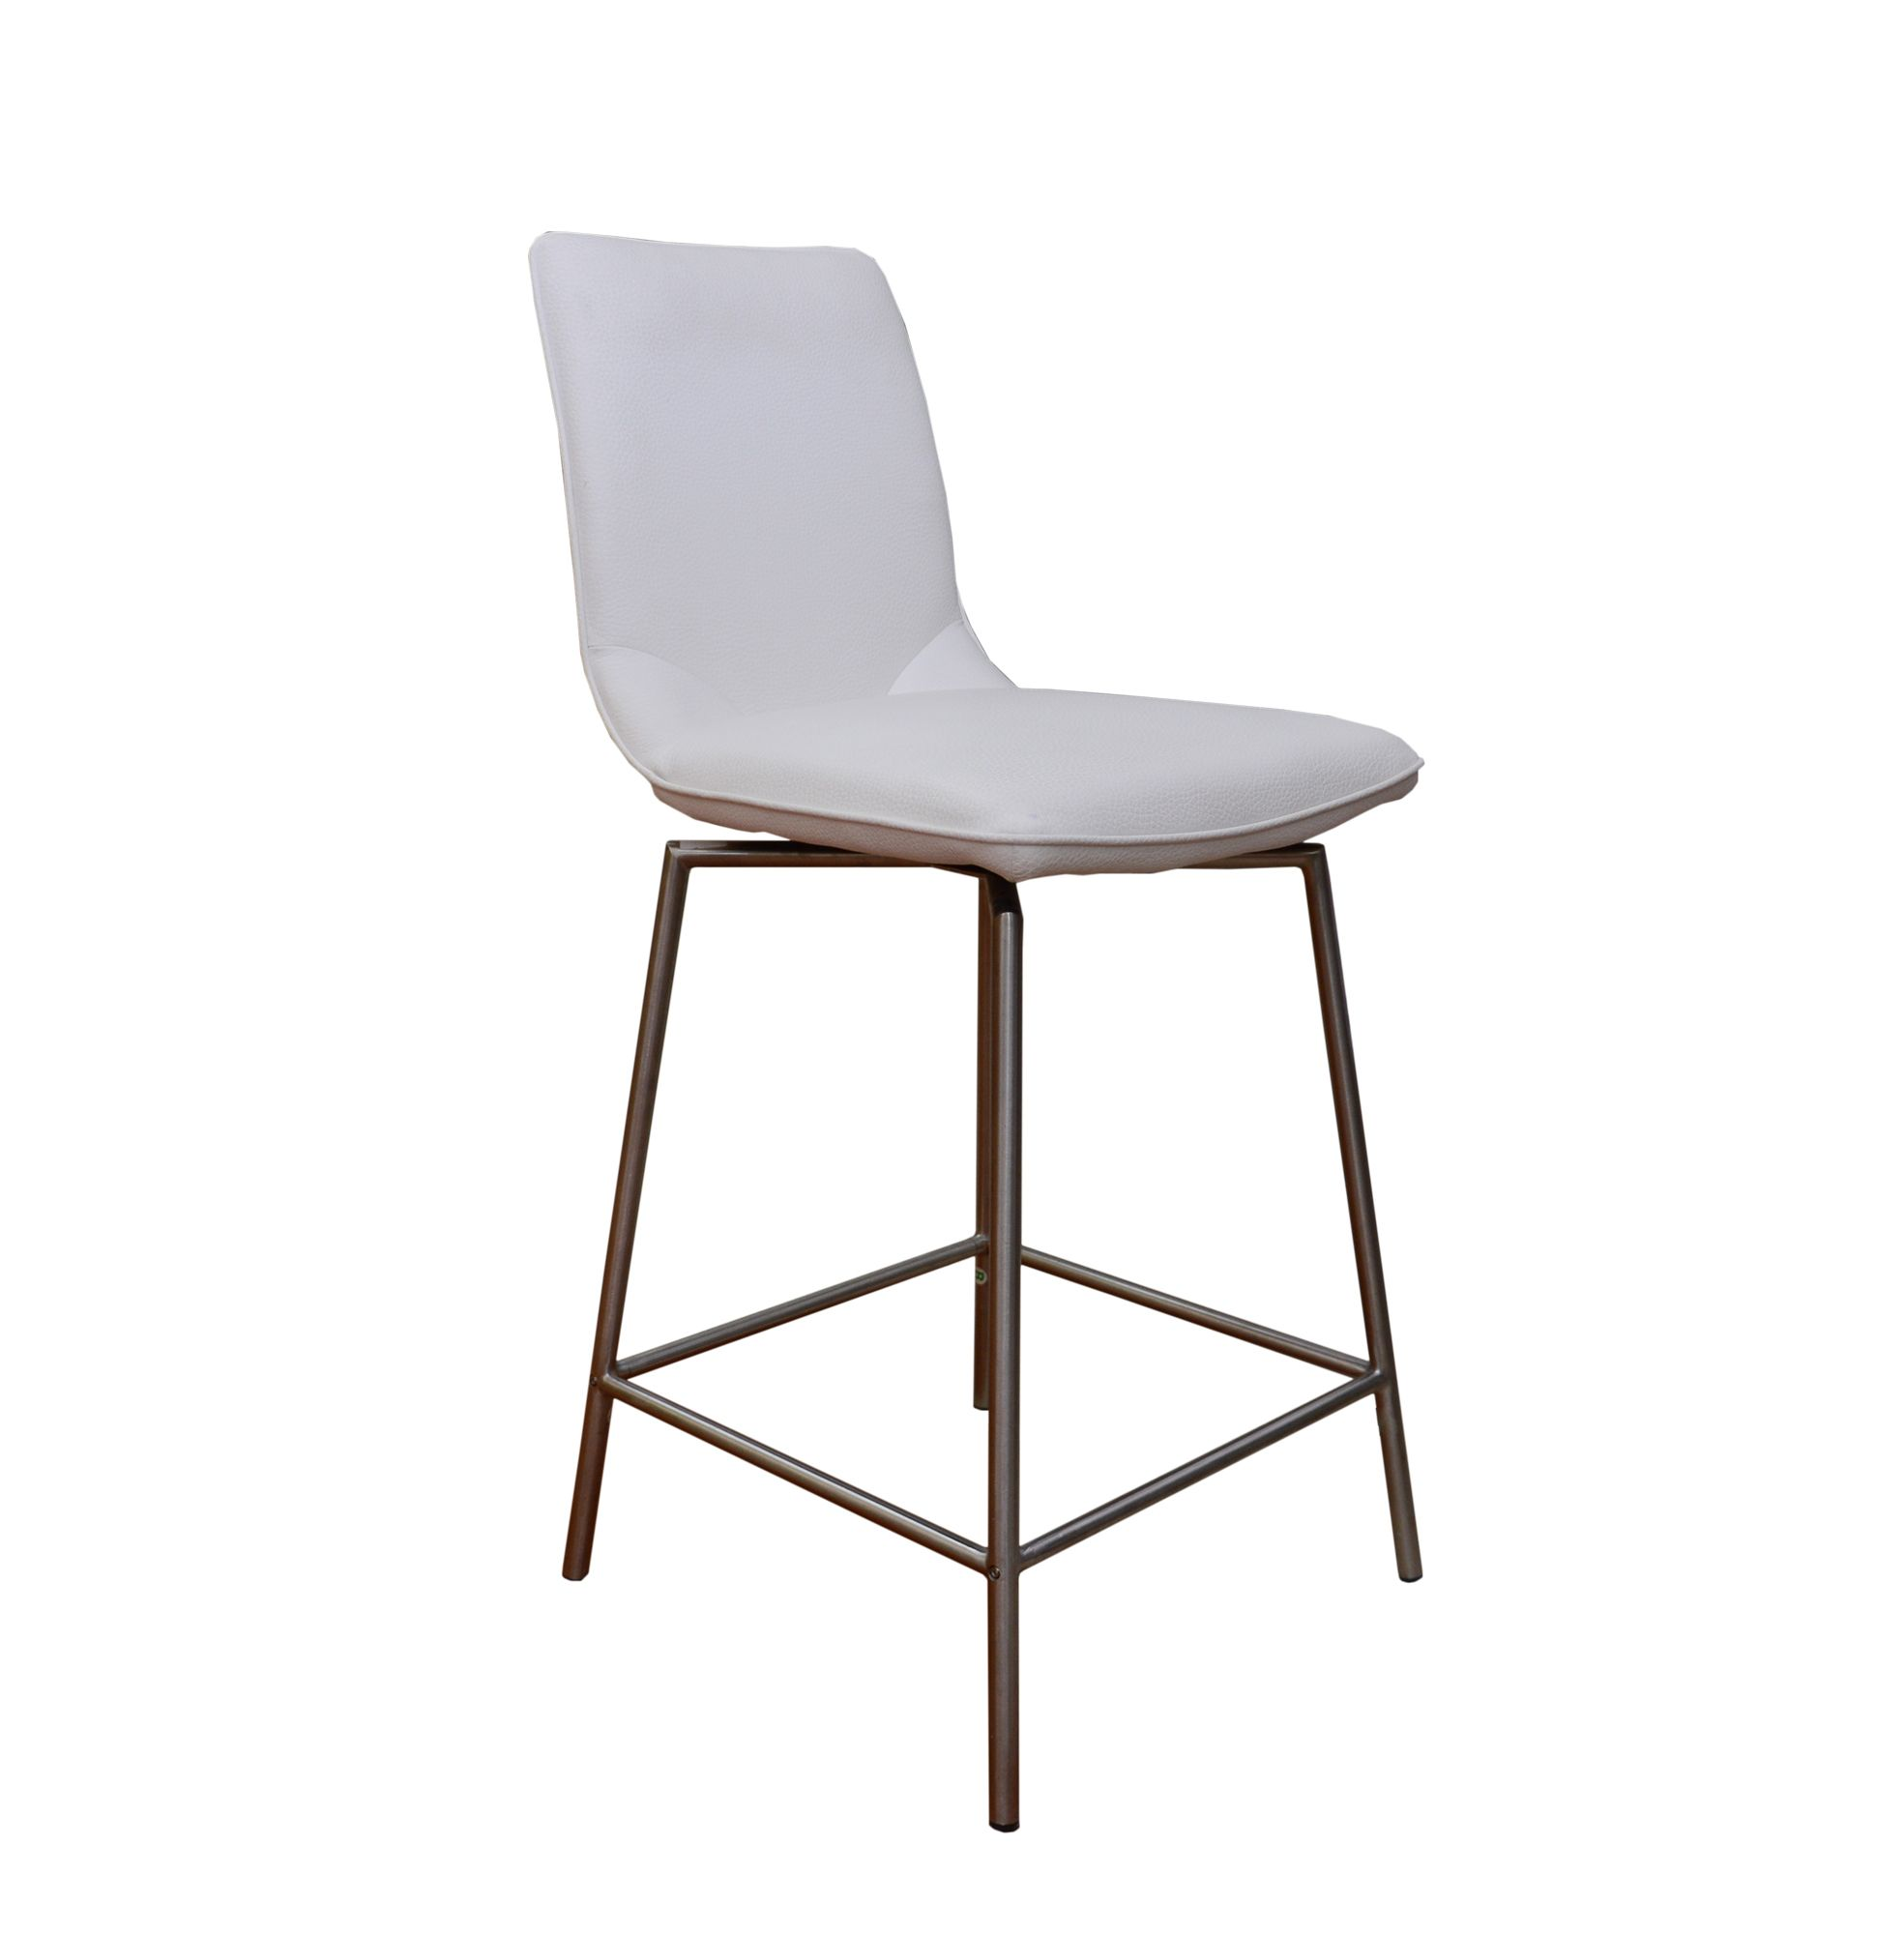 davy tatra swivel bar stool faux leather white bar stools meubles. Black Bedroom Furniture Sets. Home Design Ideas